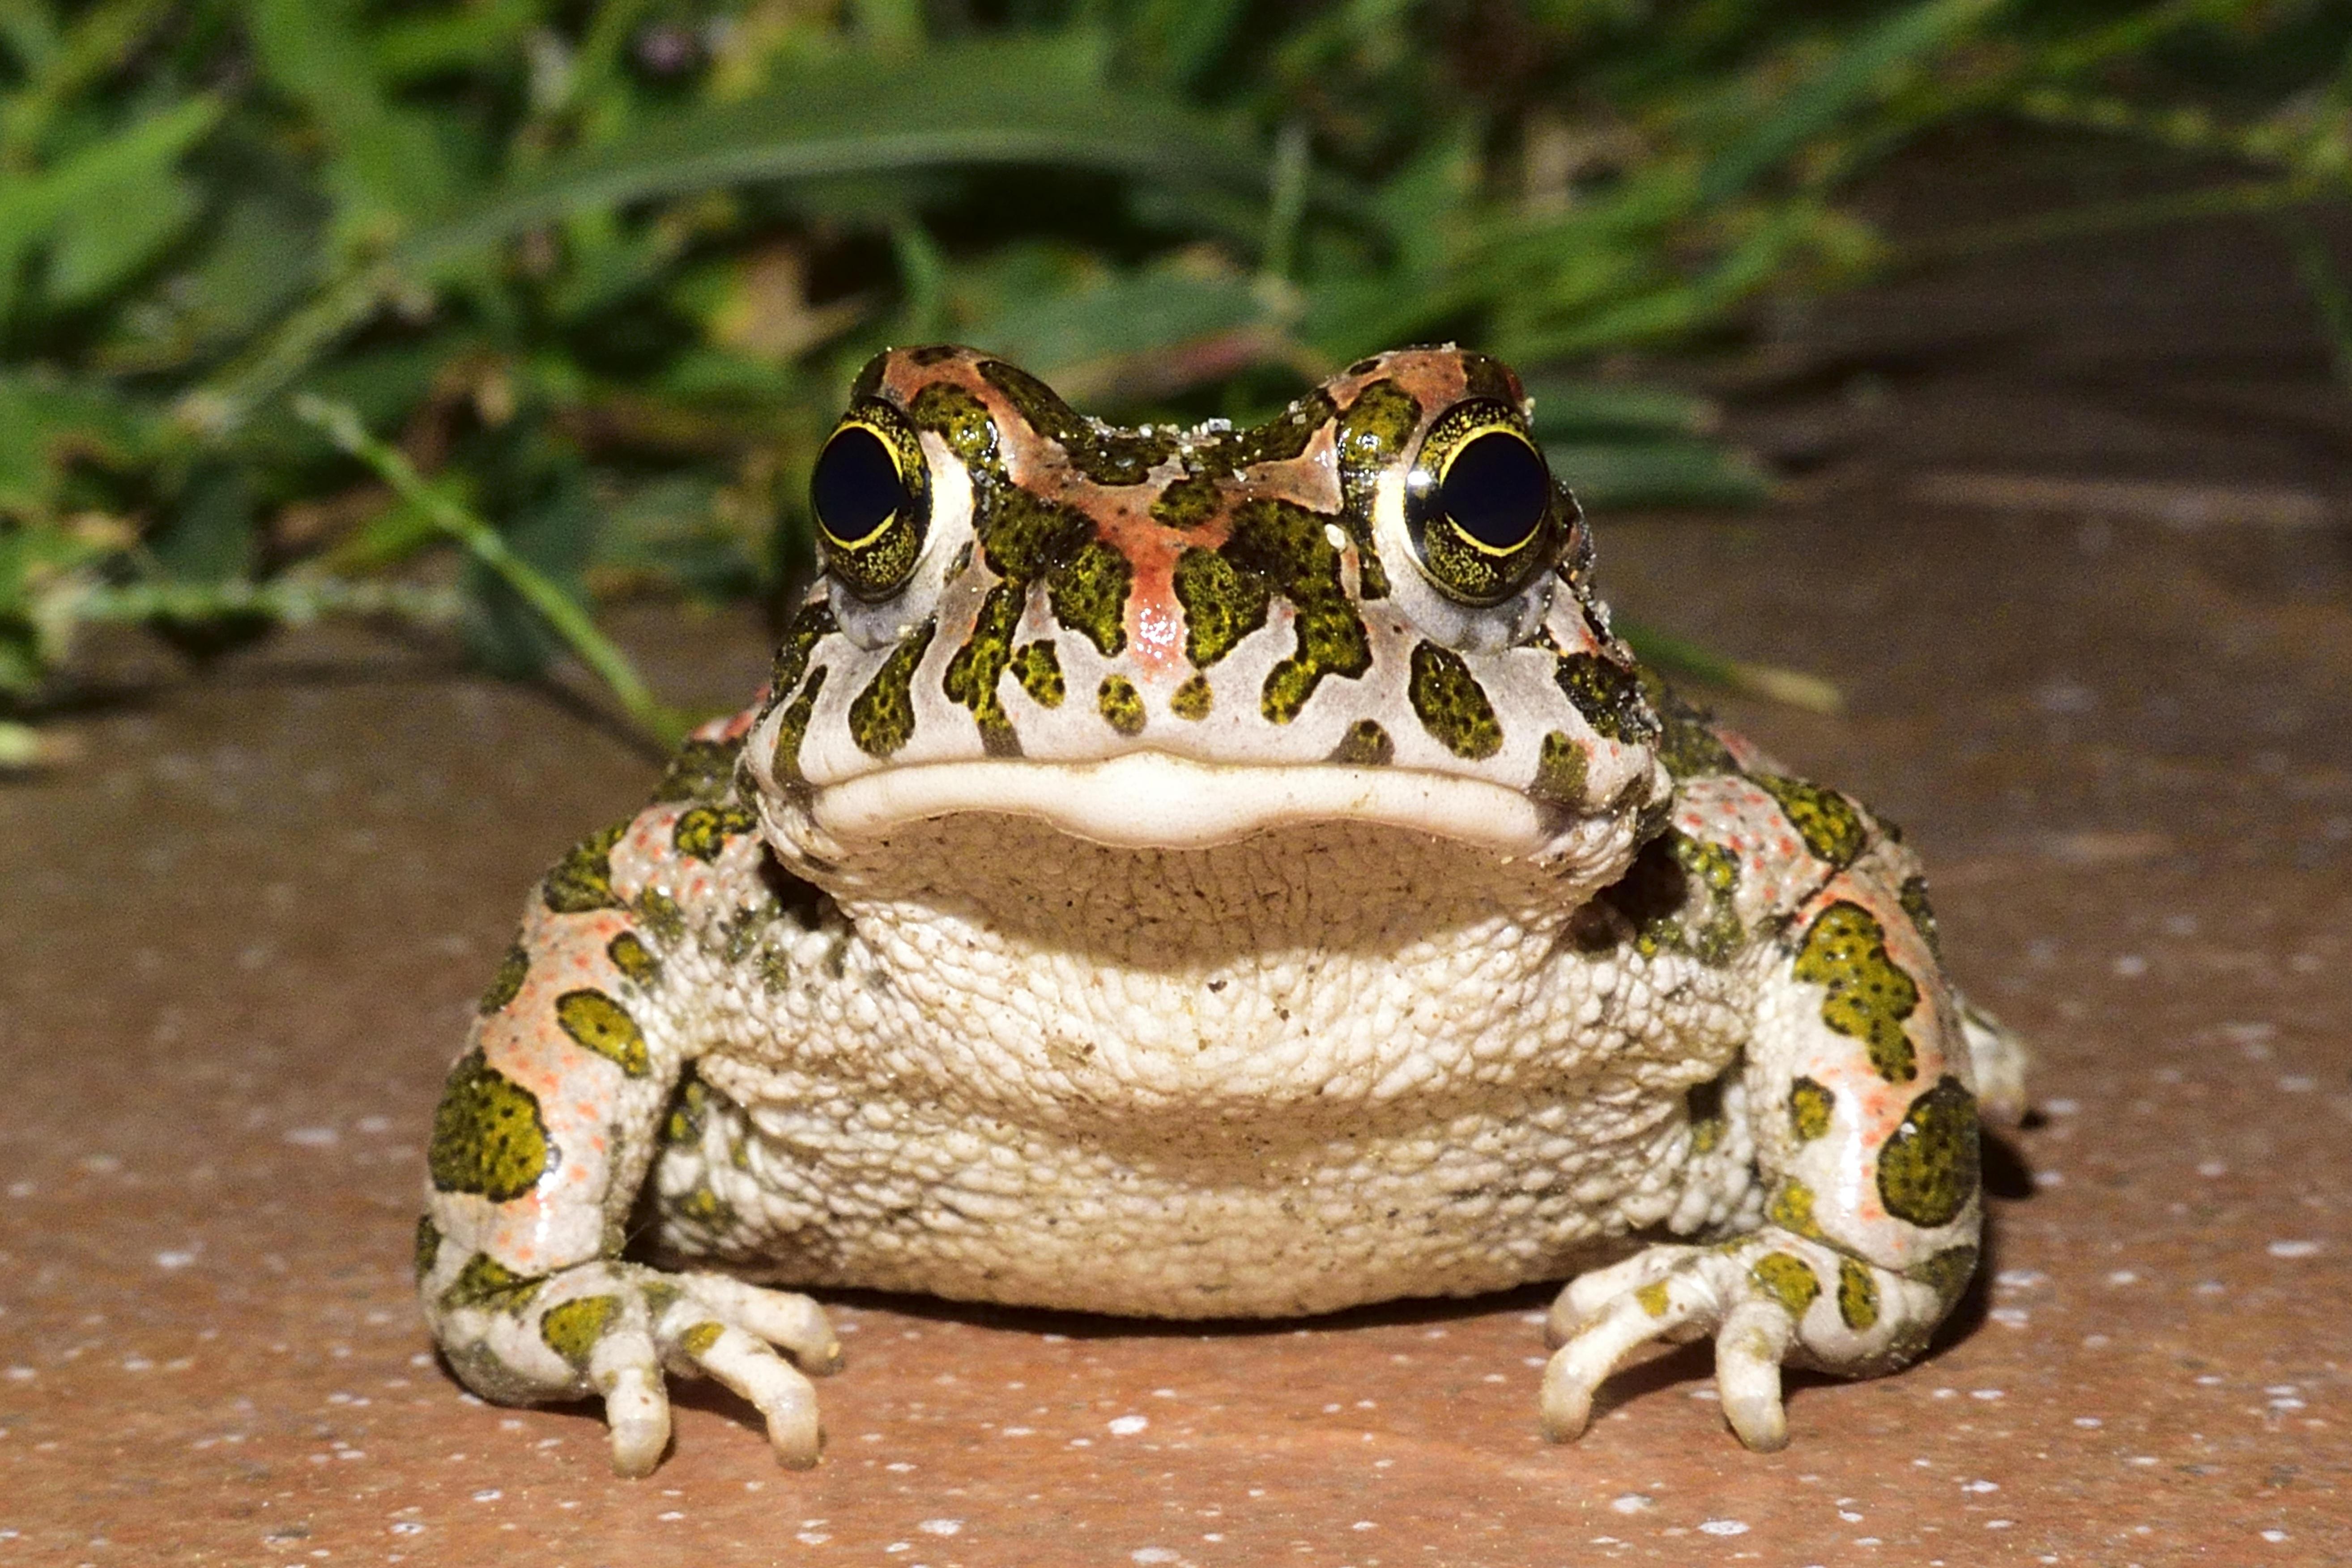 Fotos gratis : naturaleza, césped, animal, fauna silvestre, macro ...